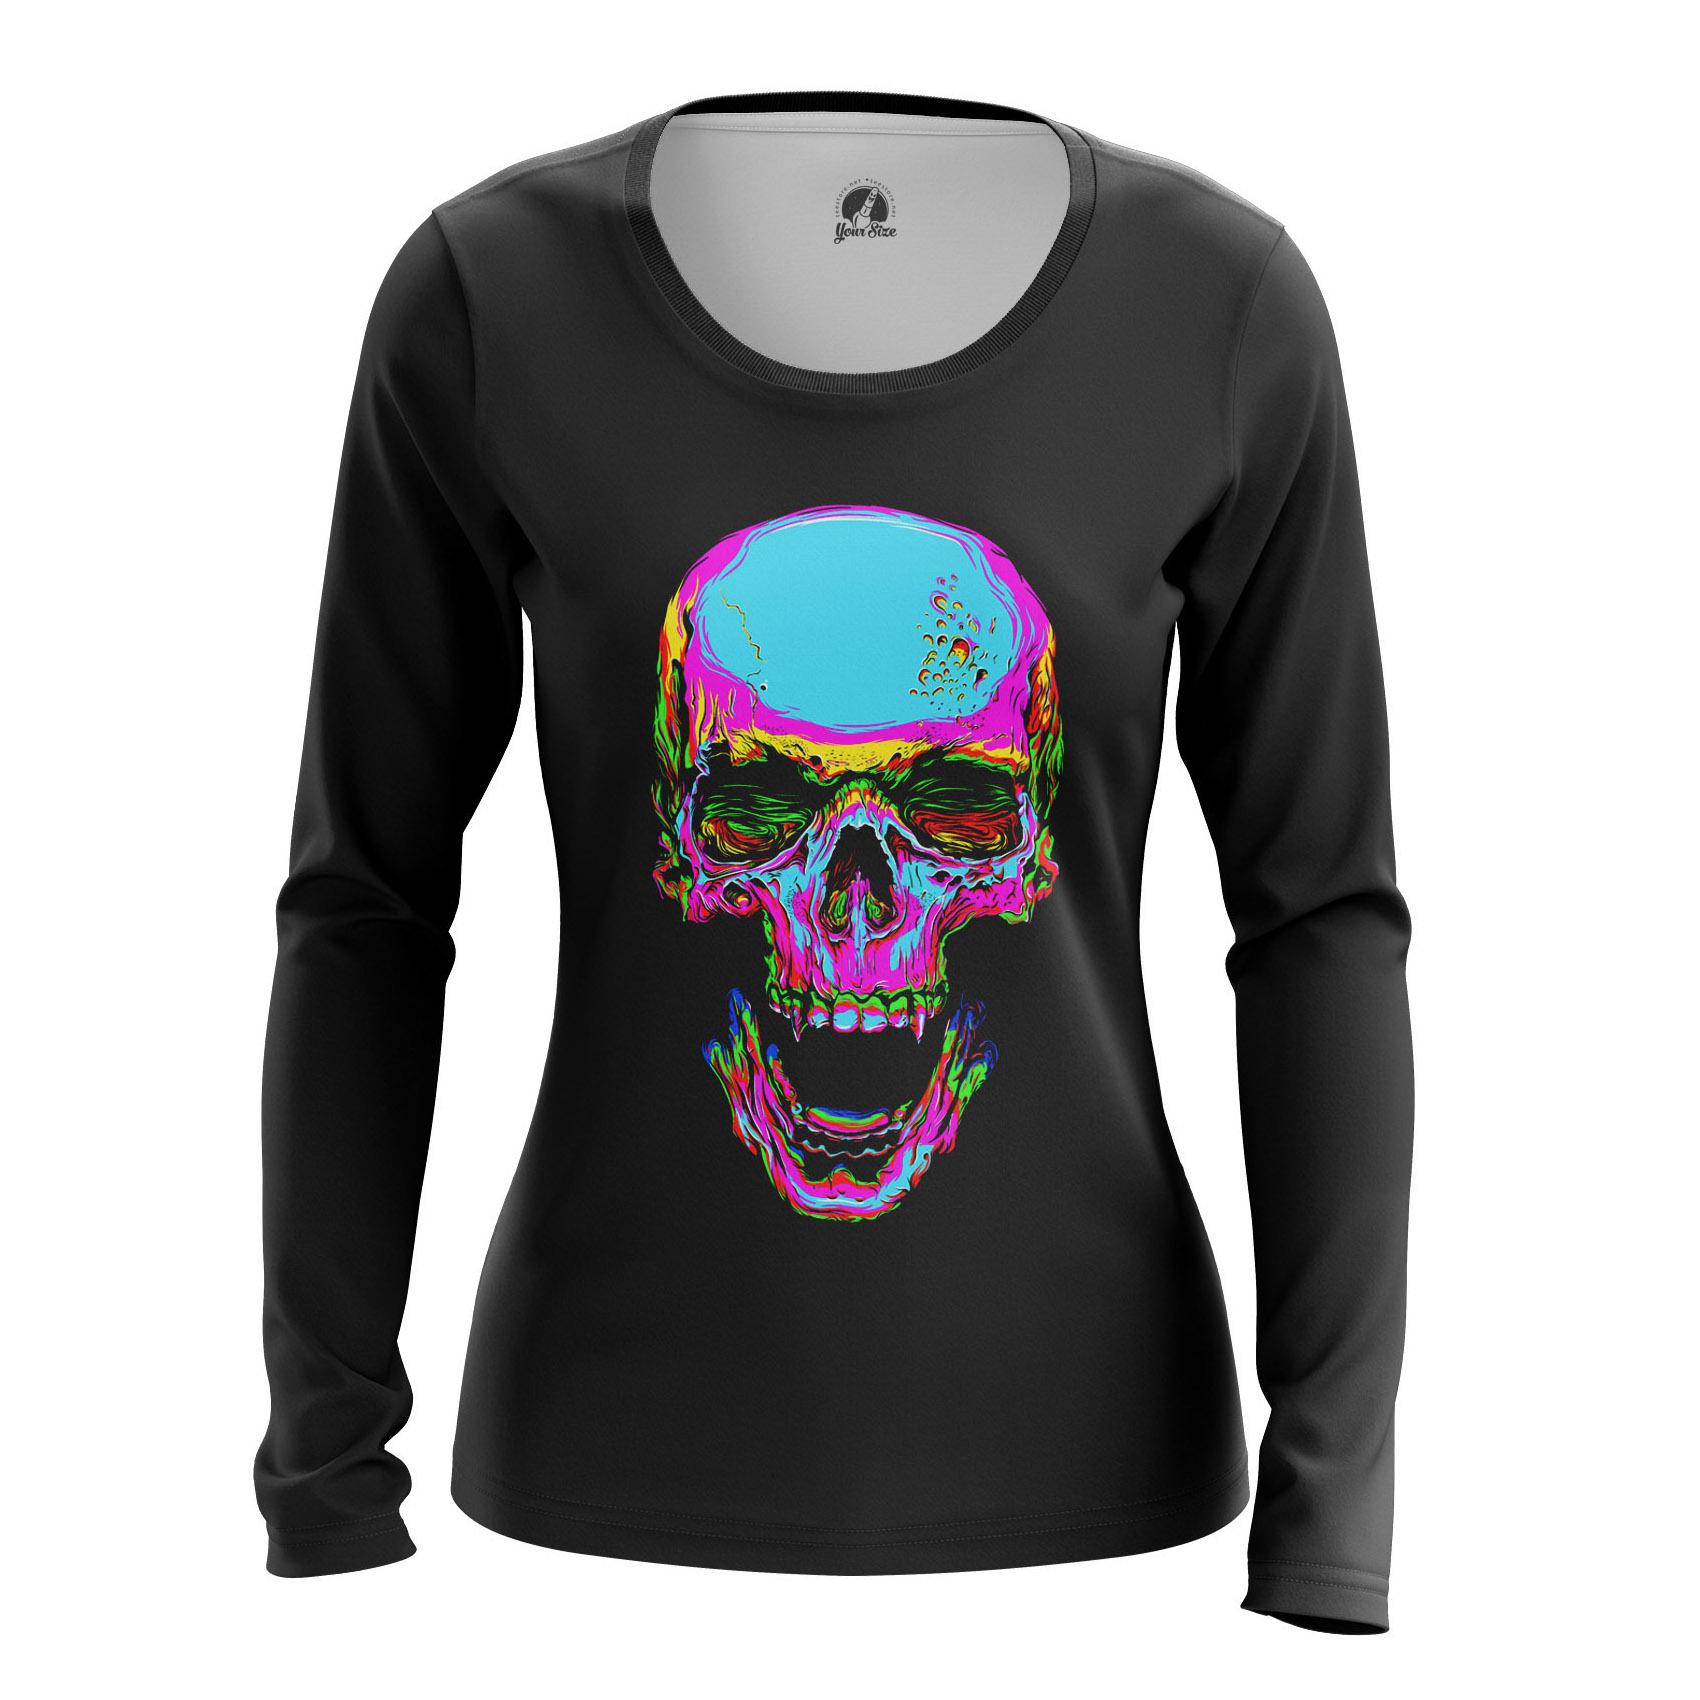 Merchandise Women'S Raglan Rainbow Skull Skulls Skeletons